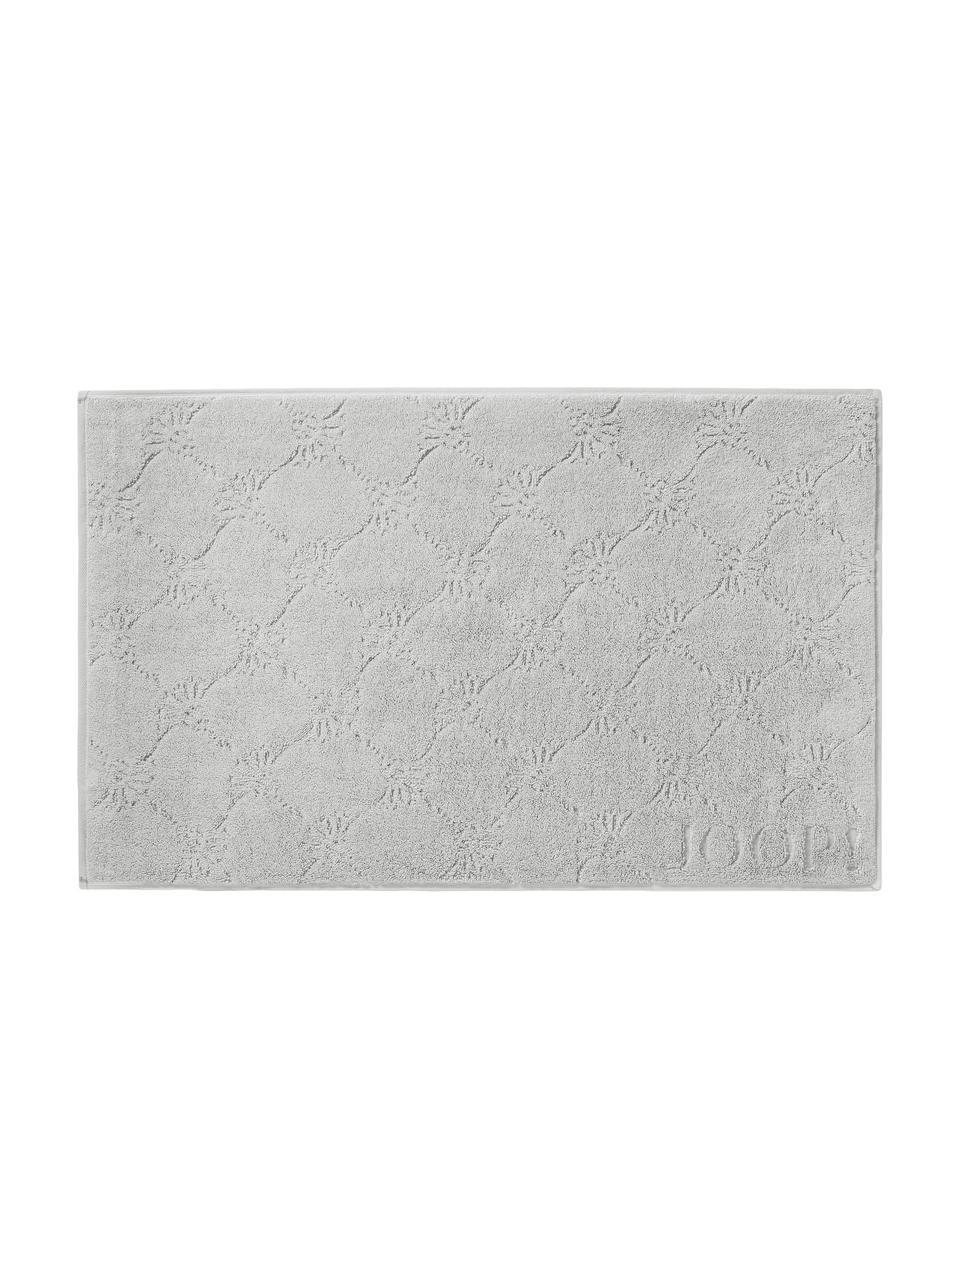 Tappeto bagno Cornflower, Grigio argento, Larg. 50 x Lung. 80 cm